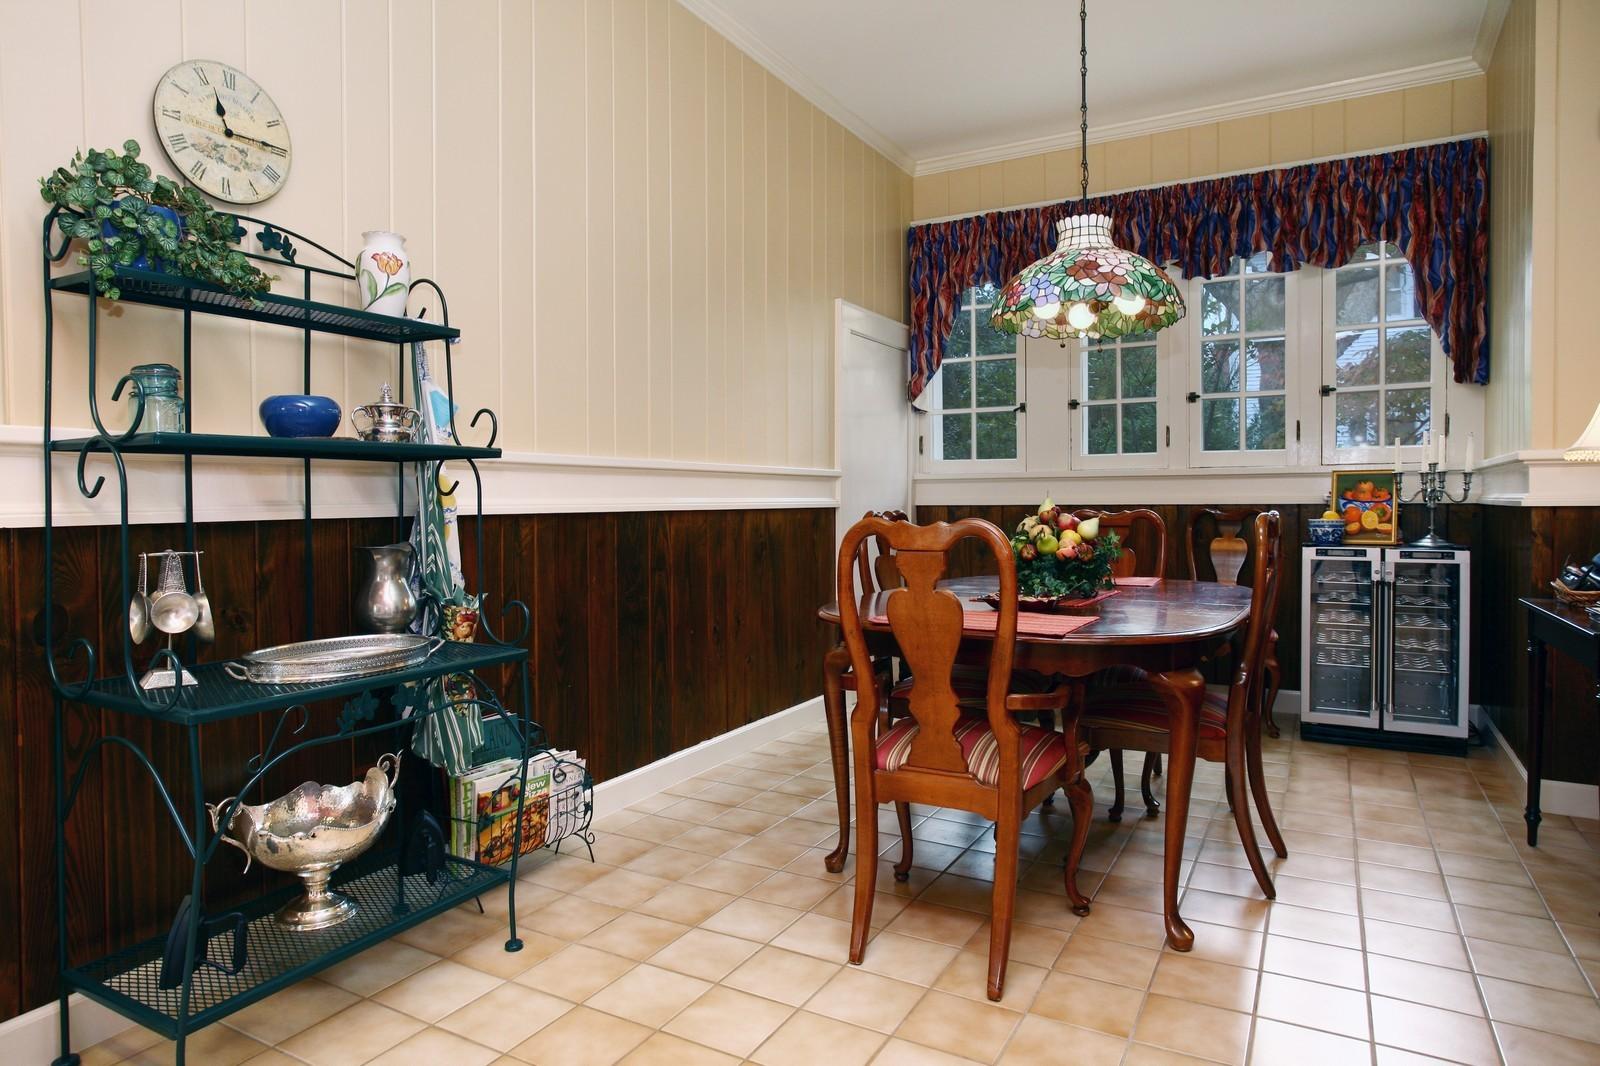 Real Estate Photography - 414 N 14th St, Lanett, AL, 36863 - Breakfast Nook